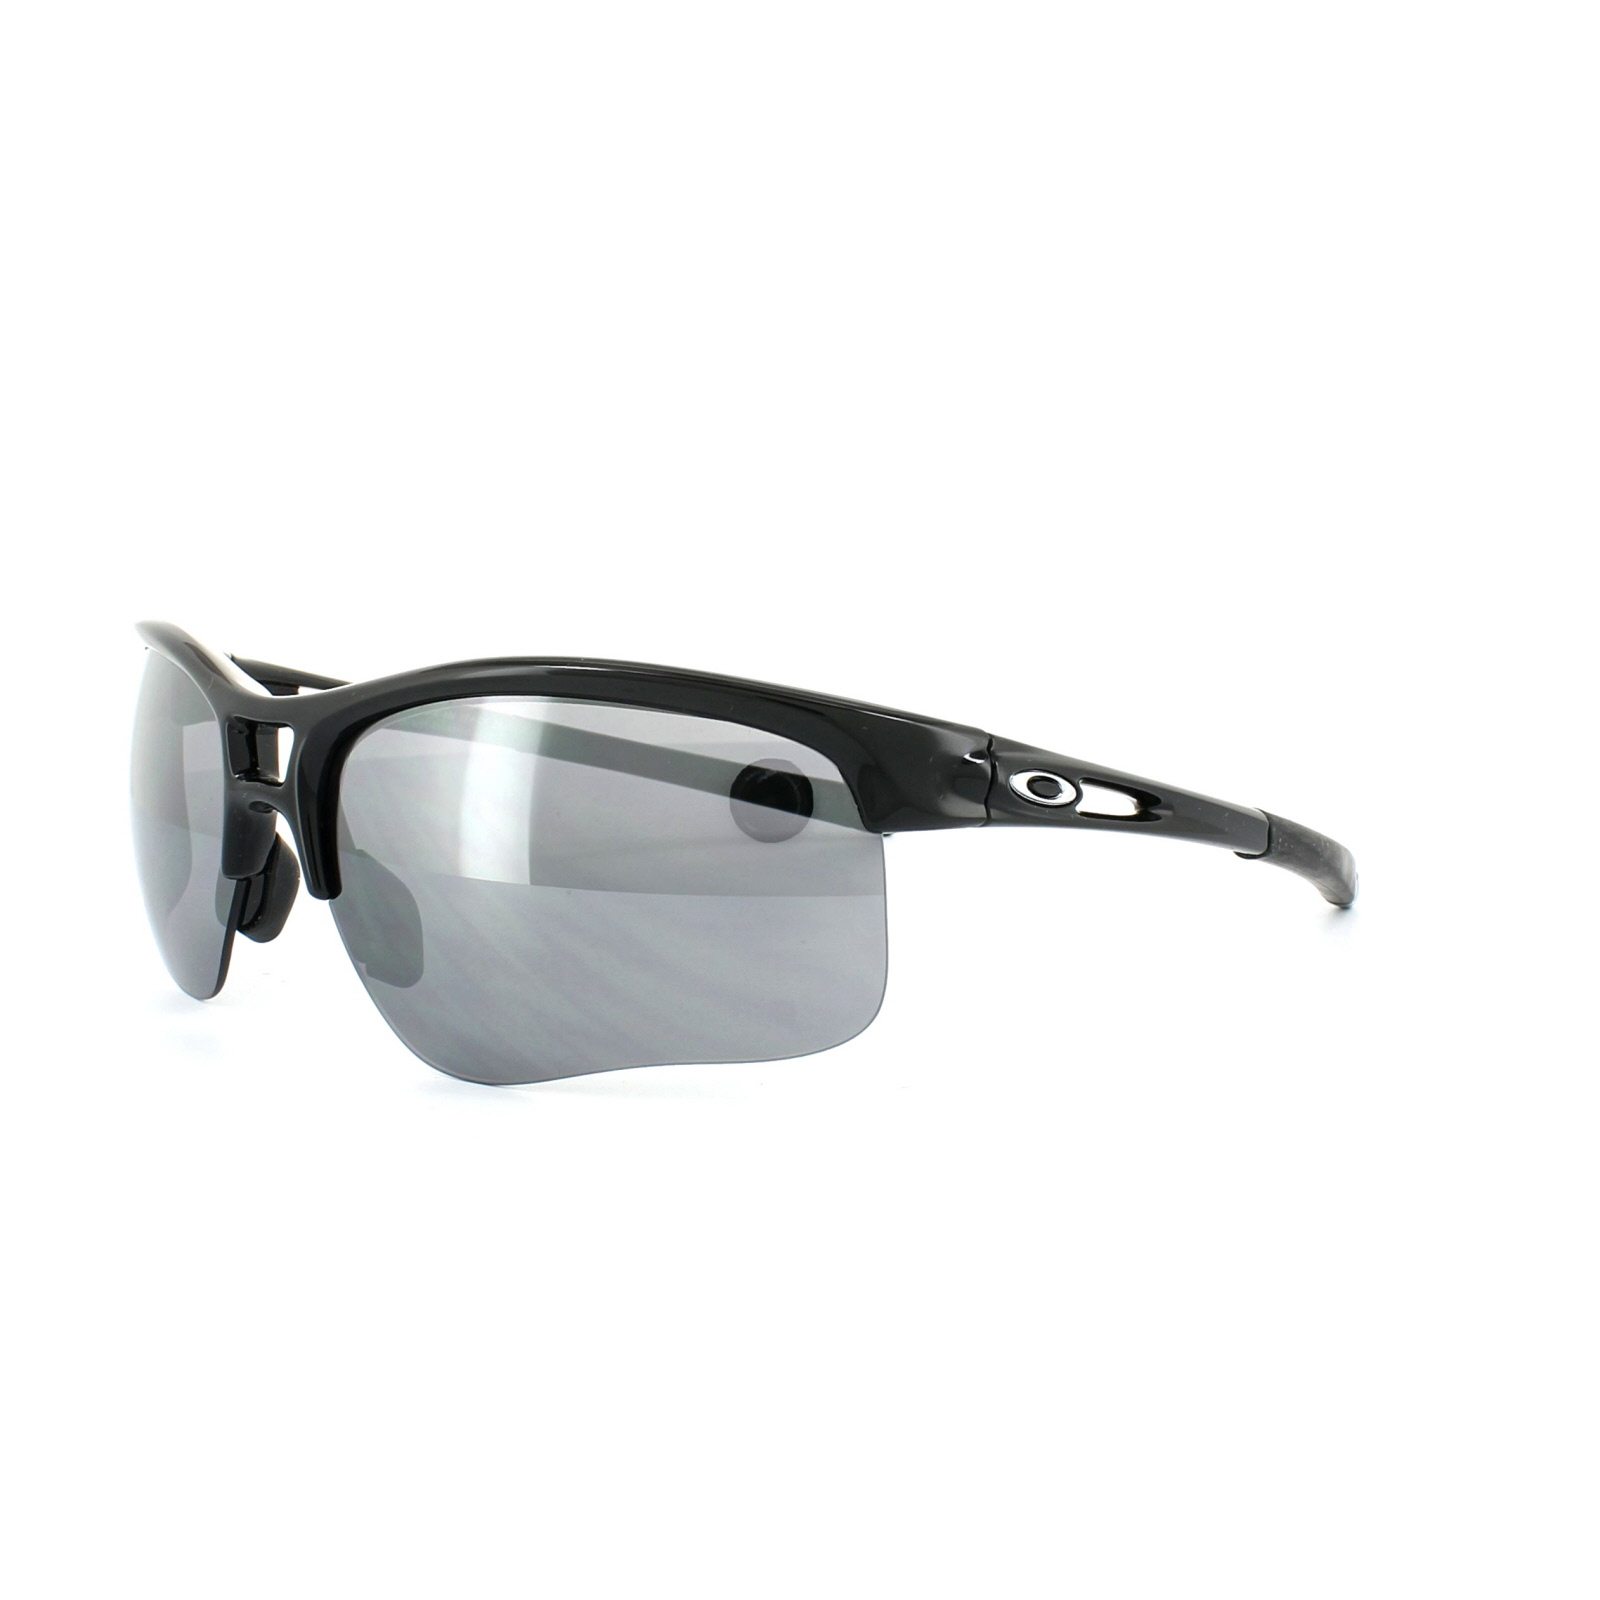 1192705055 Sentinel Oakley Sunglasses RPM Edge OO9257-01 Polished Black Black Iridium.  Sentinel Thumbnail 2